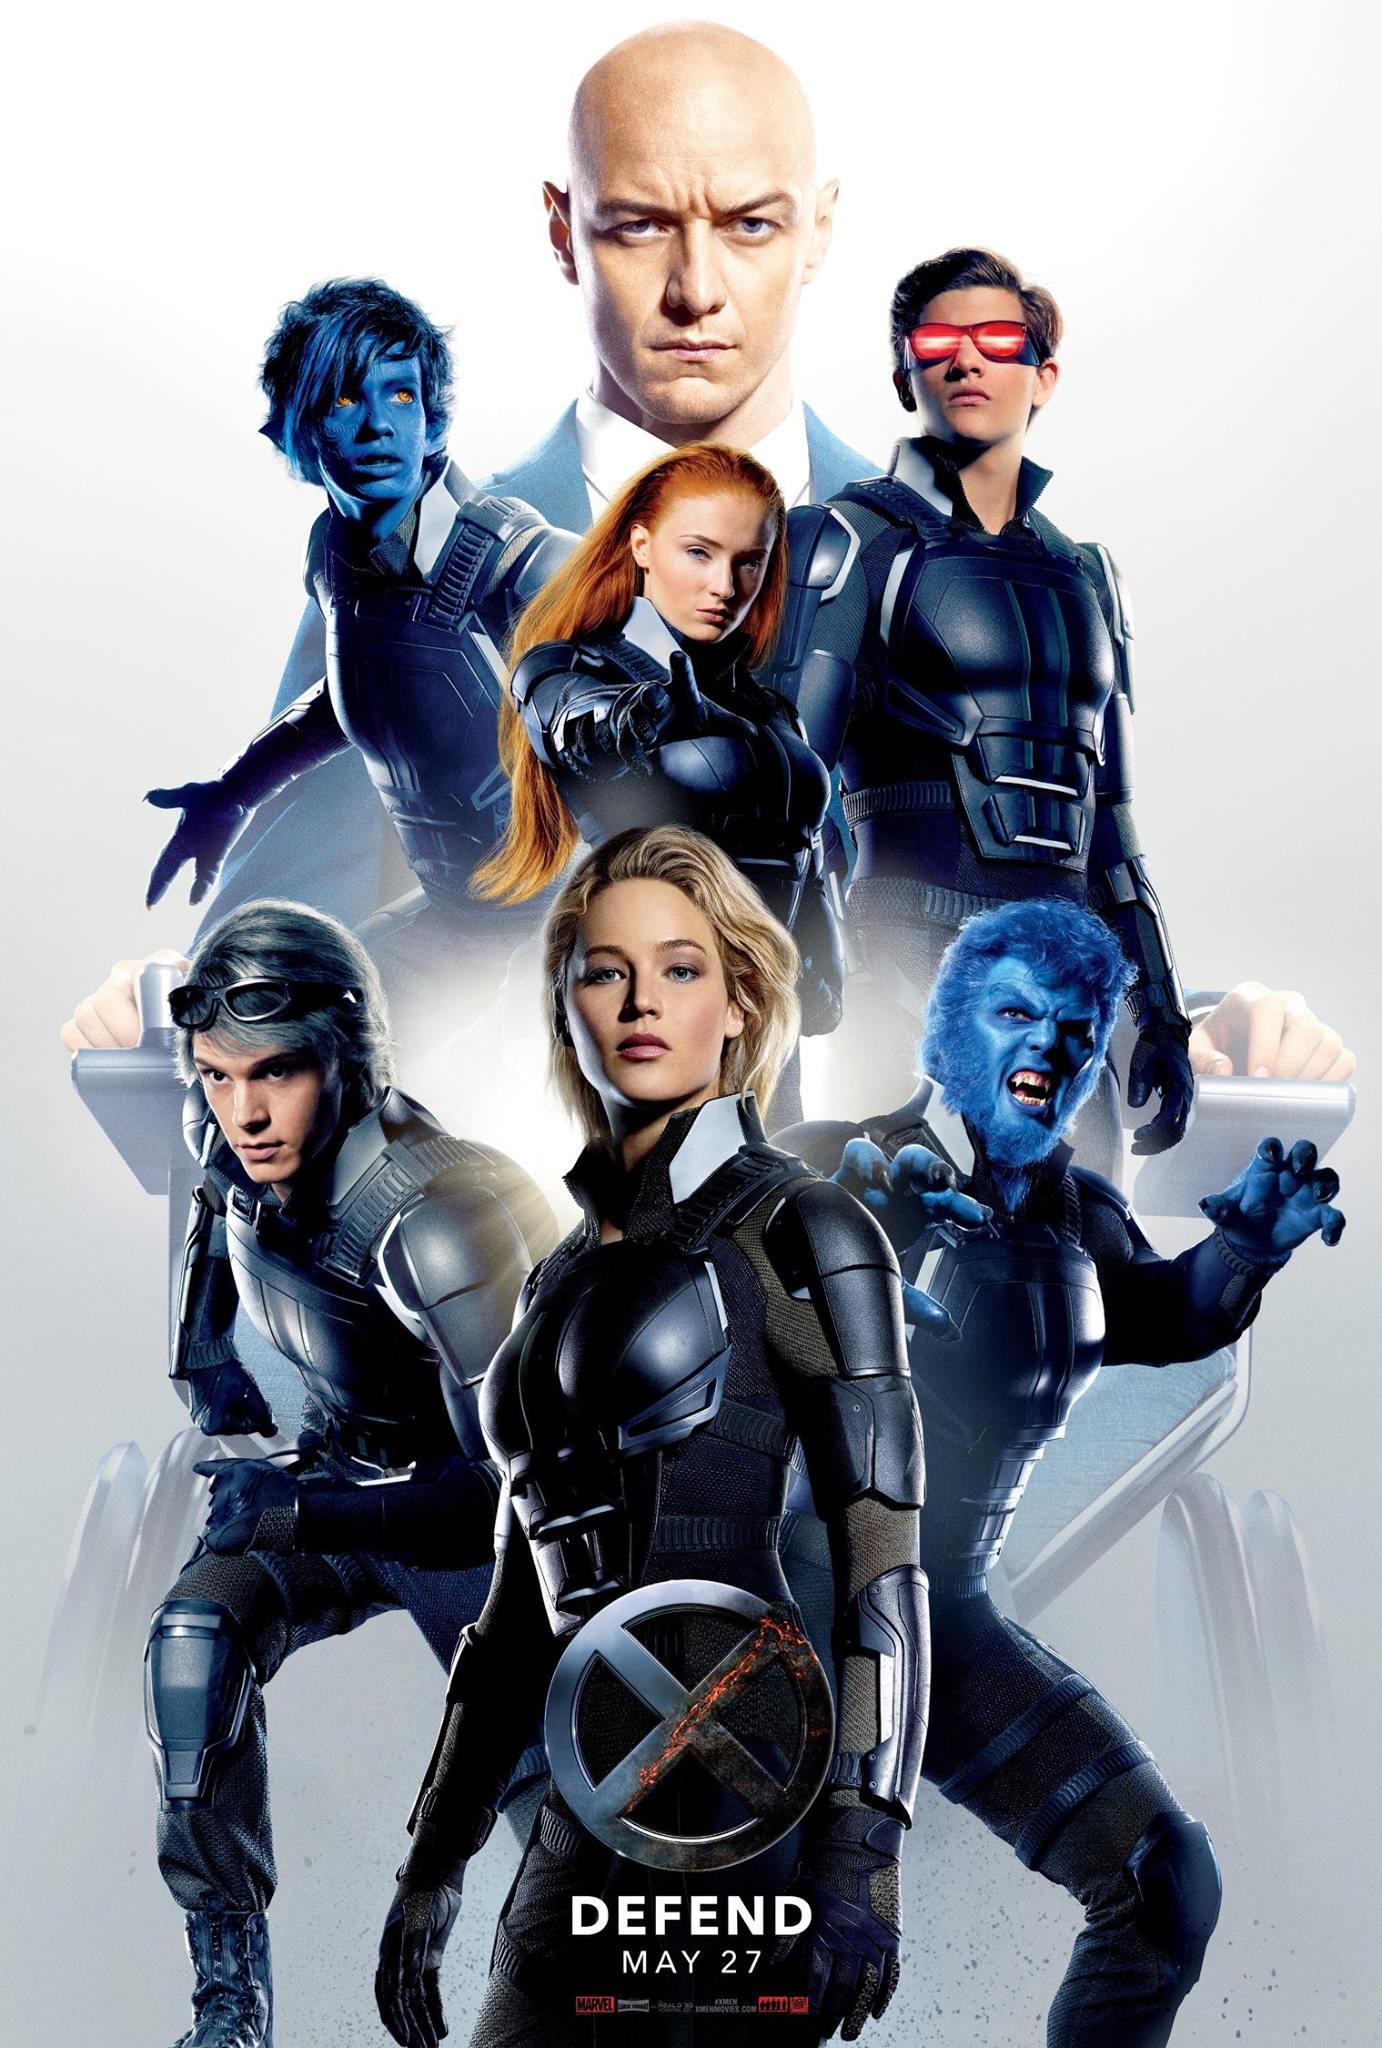 X-Men: Apocalypse DEFEND poster